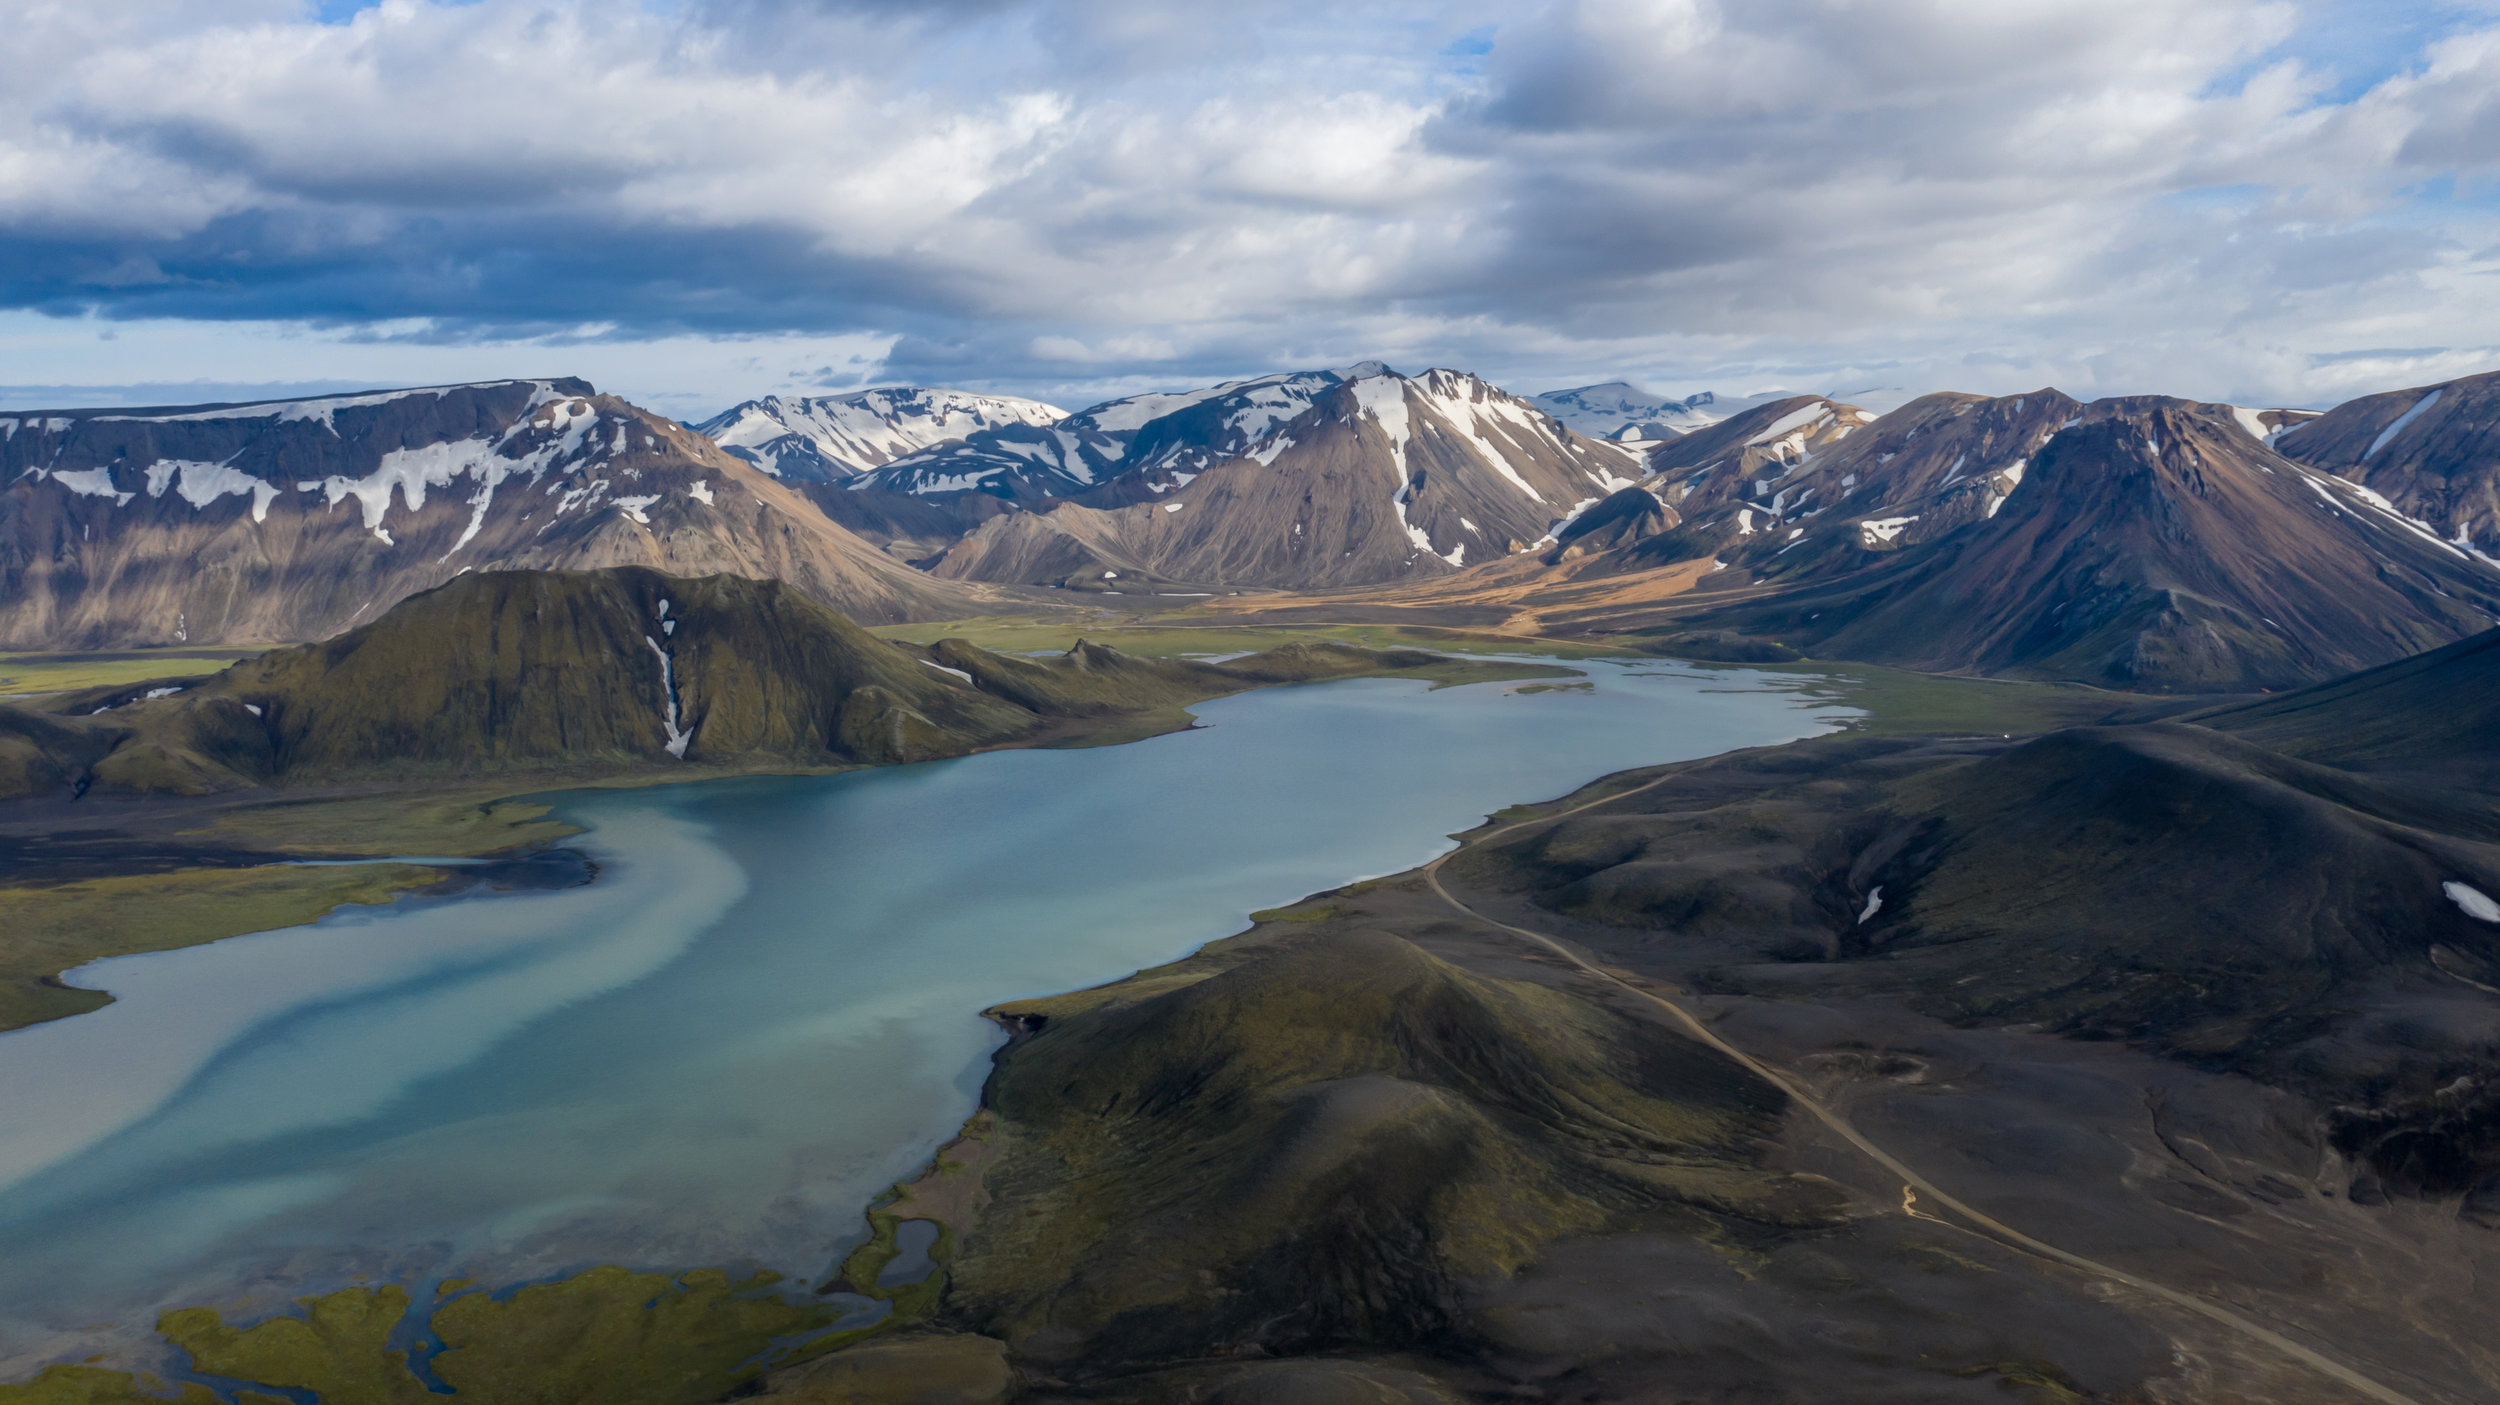 Looking towards Fjallabak-Nyrðra